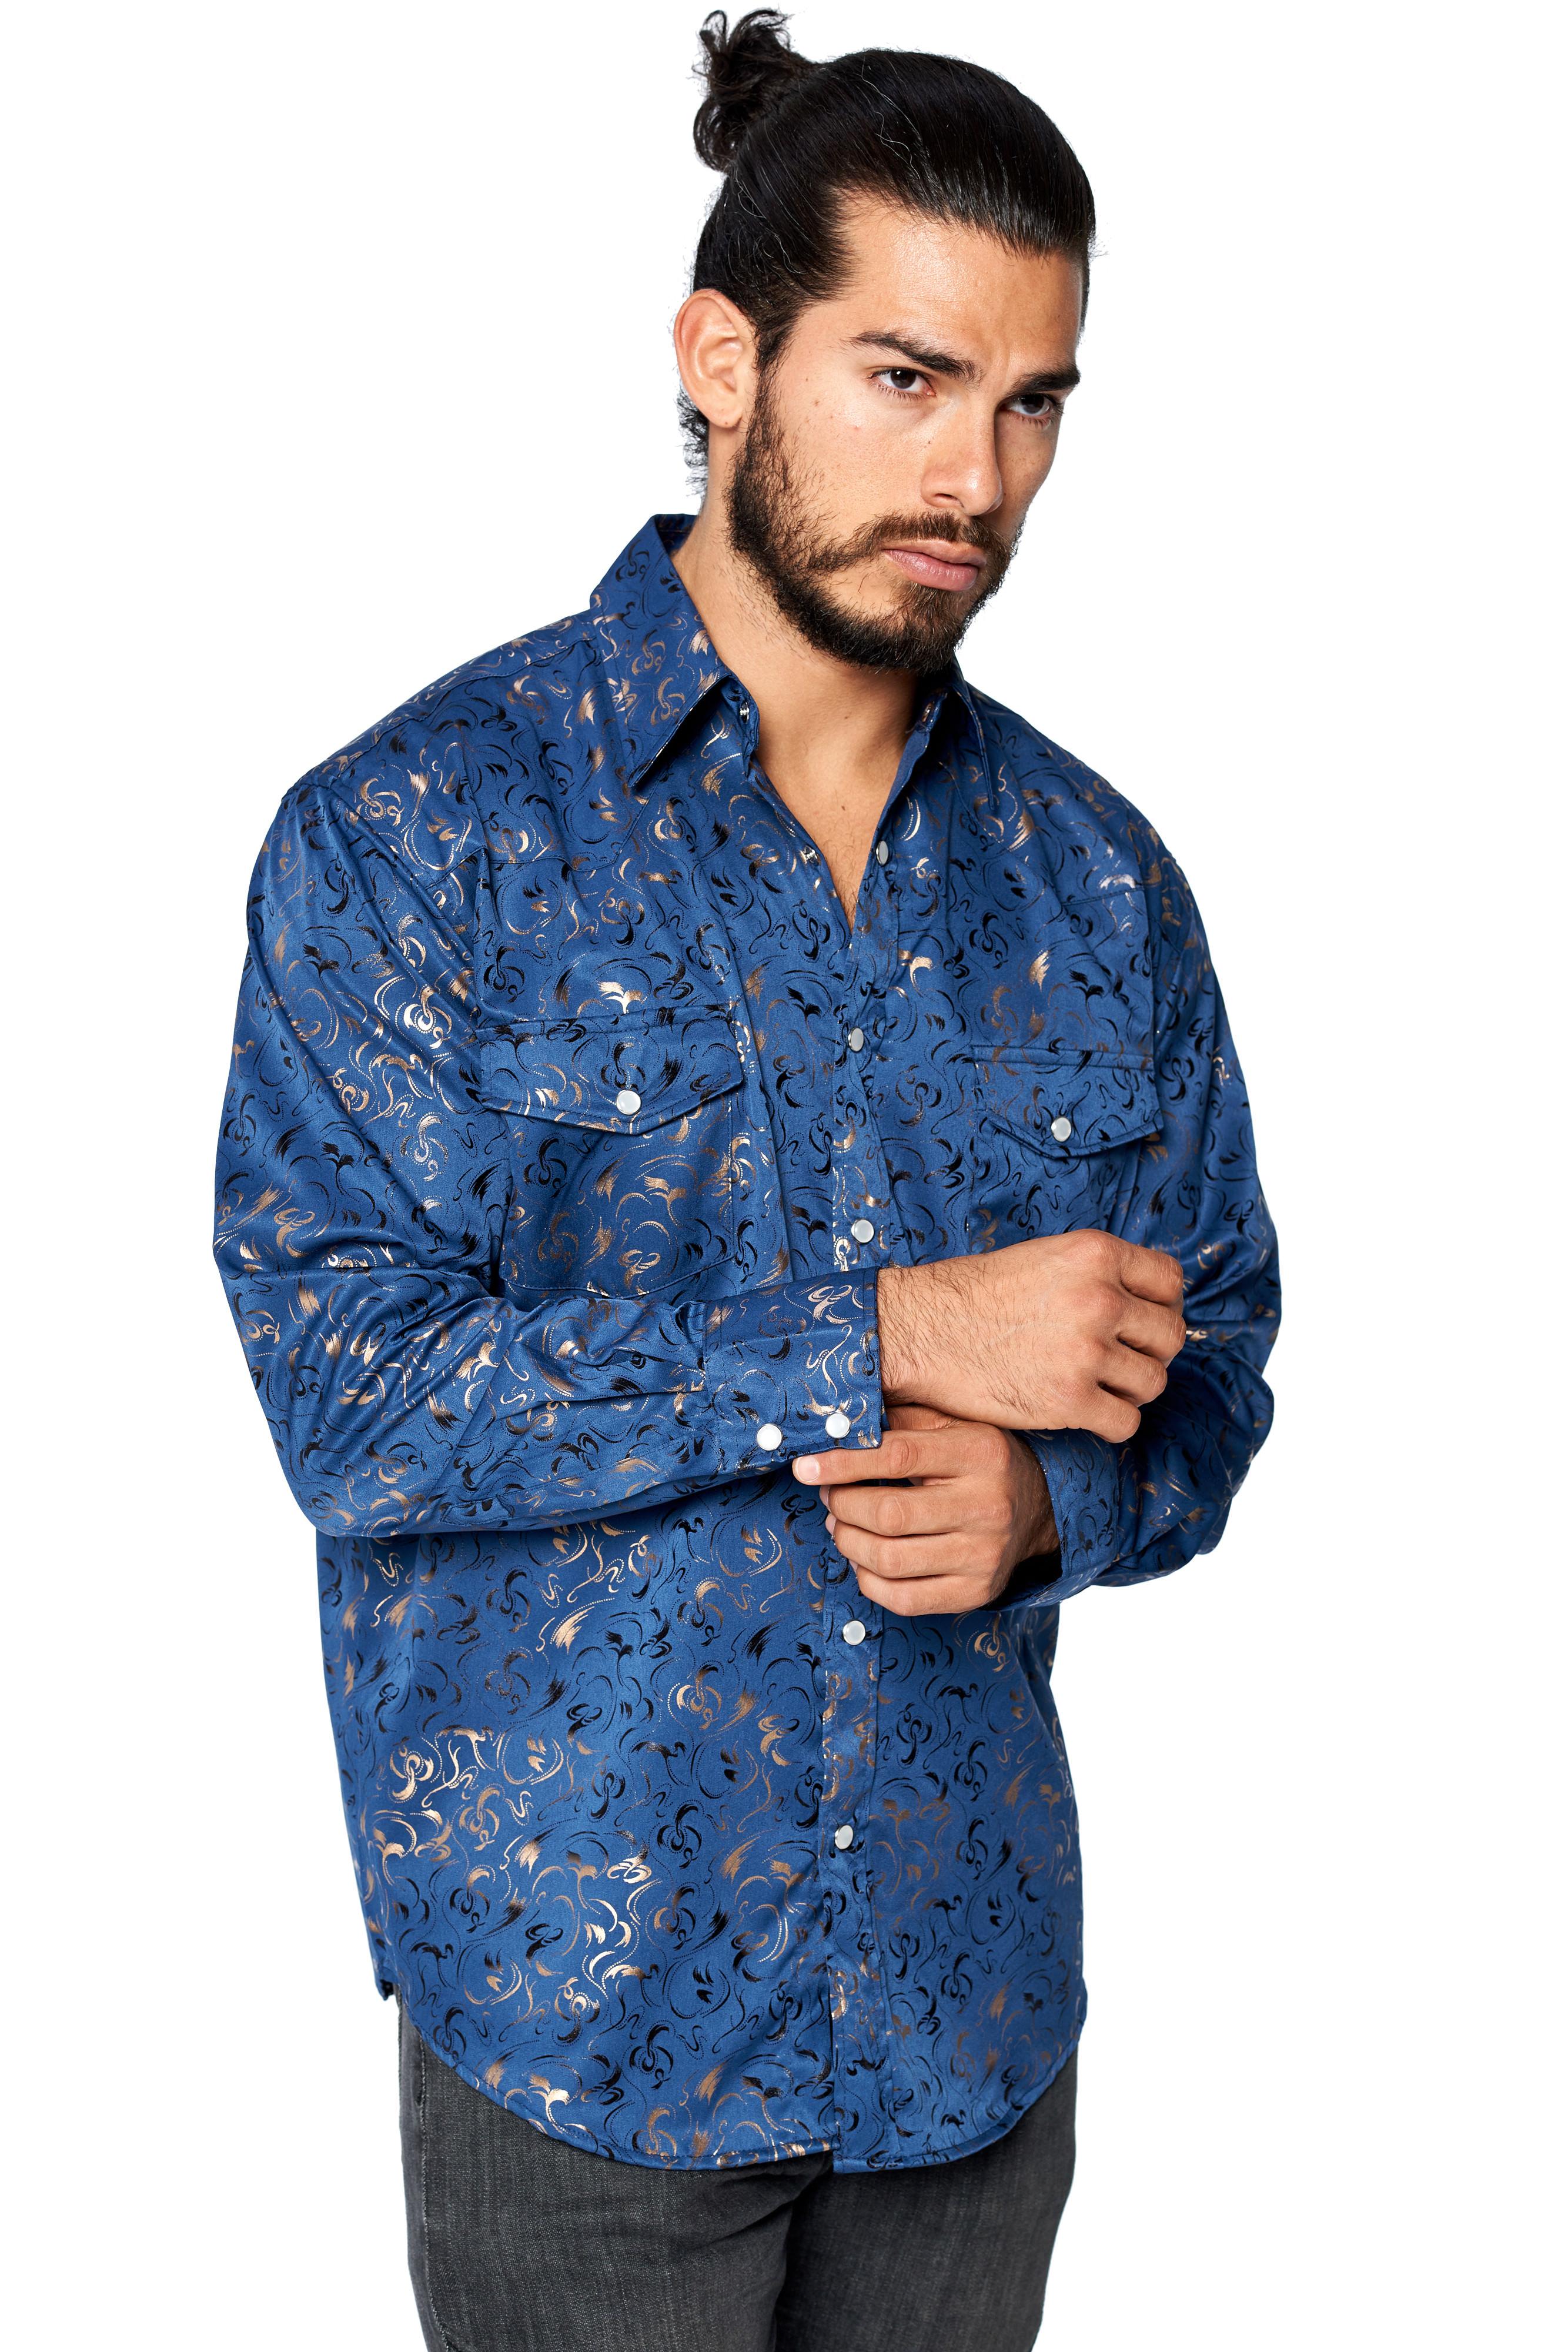 LW-Men-039-s-Pearl-Snap-Tribal-Stylish-Printed-Woven-Western-Vaquero-Rodeo-Shirt thumbnail 6